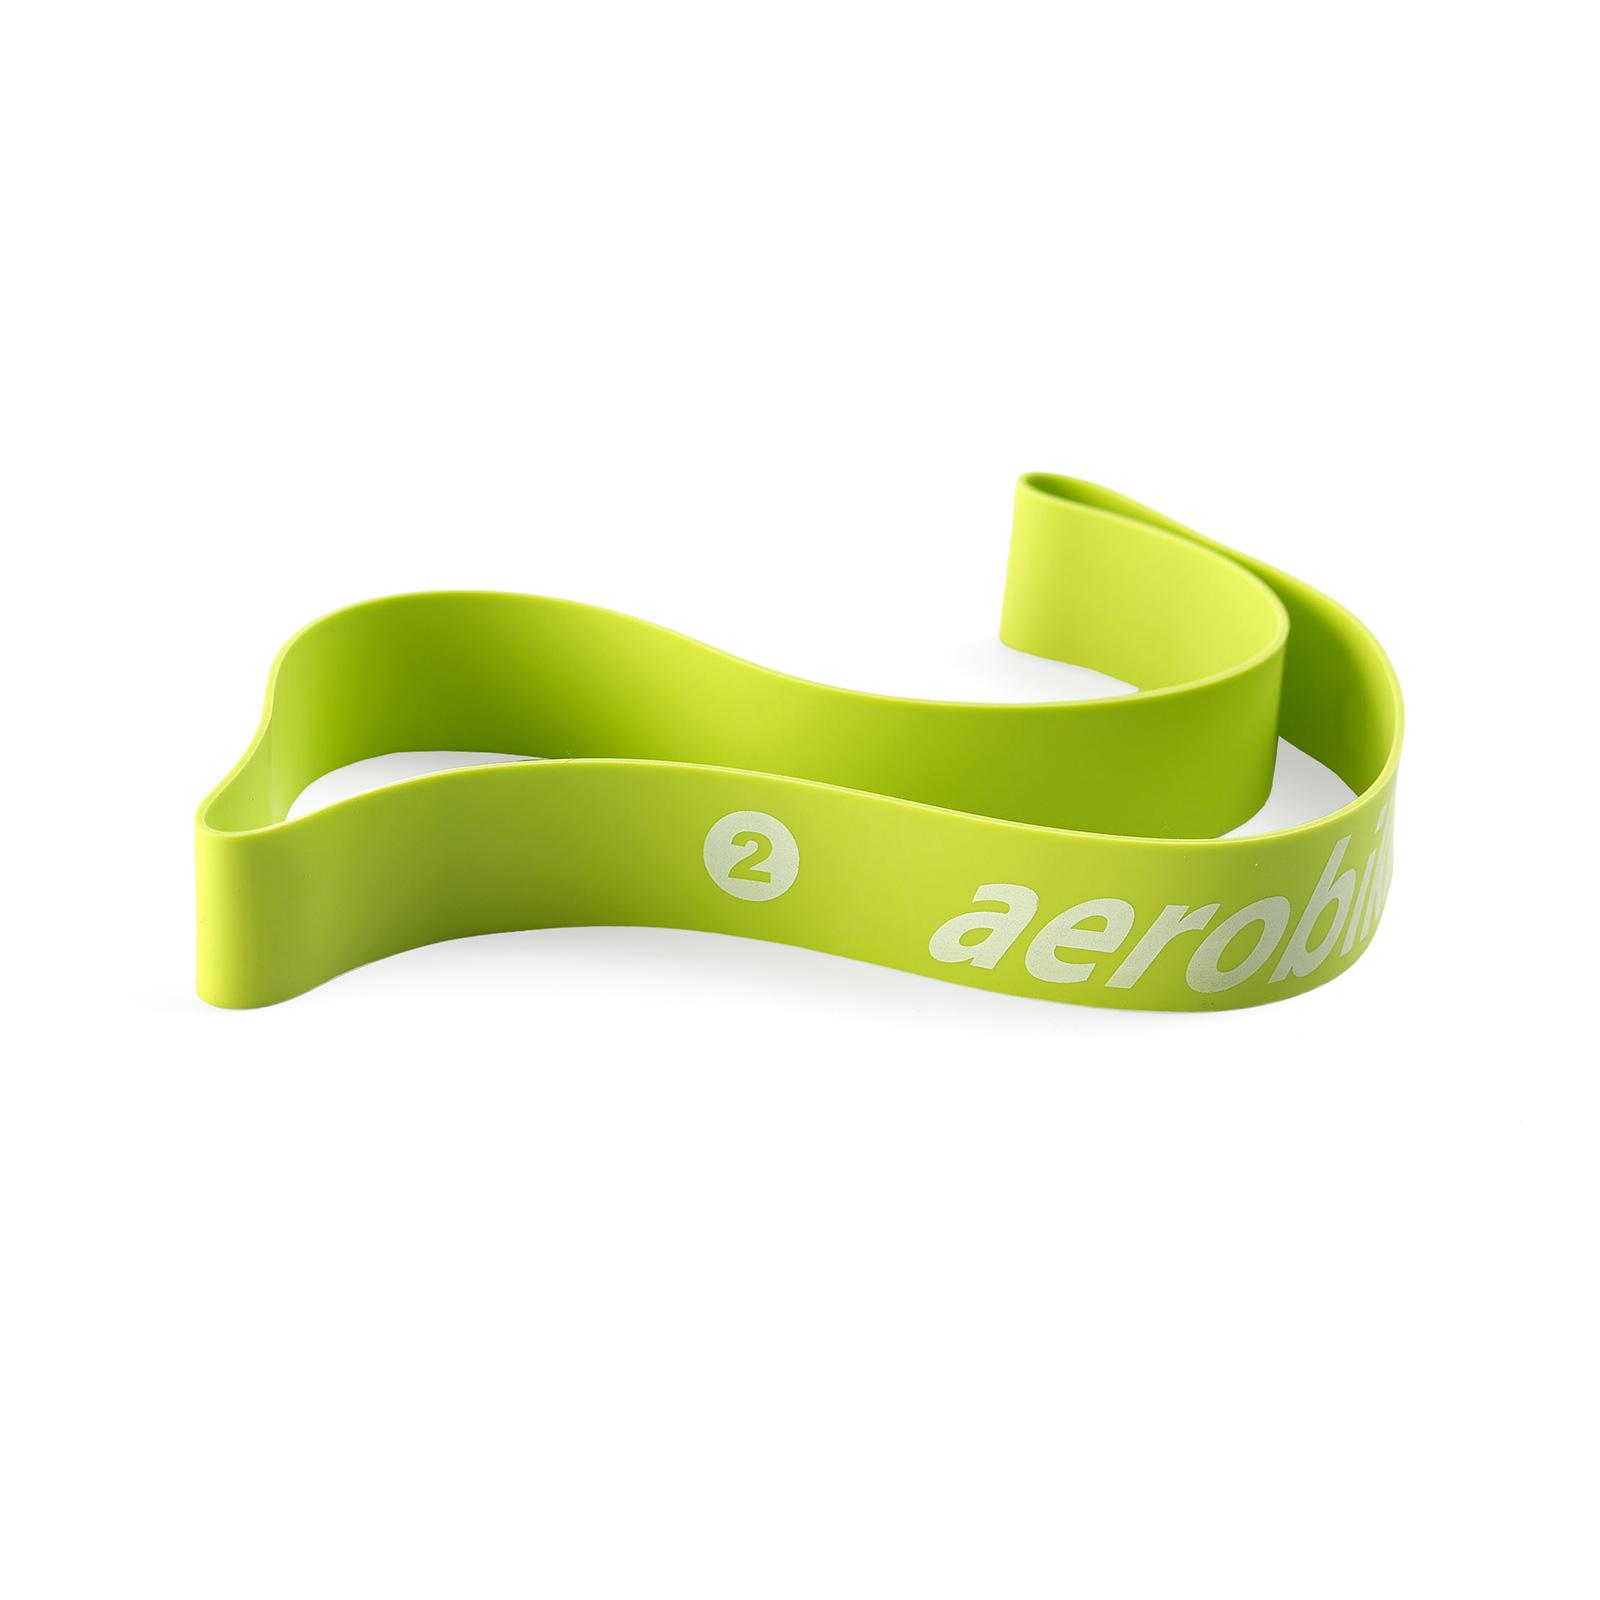 Bande élastique verte Aerobika Moyen